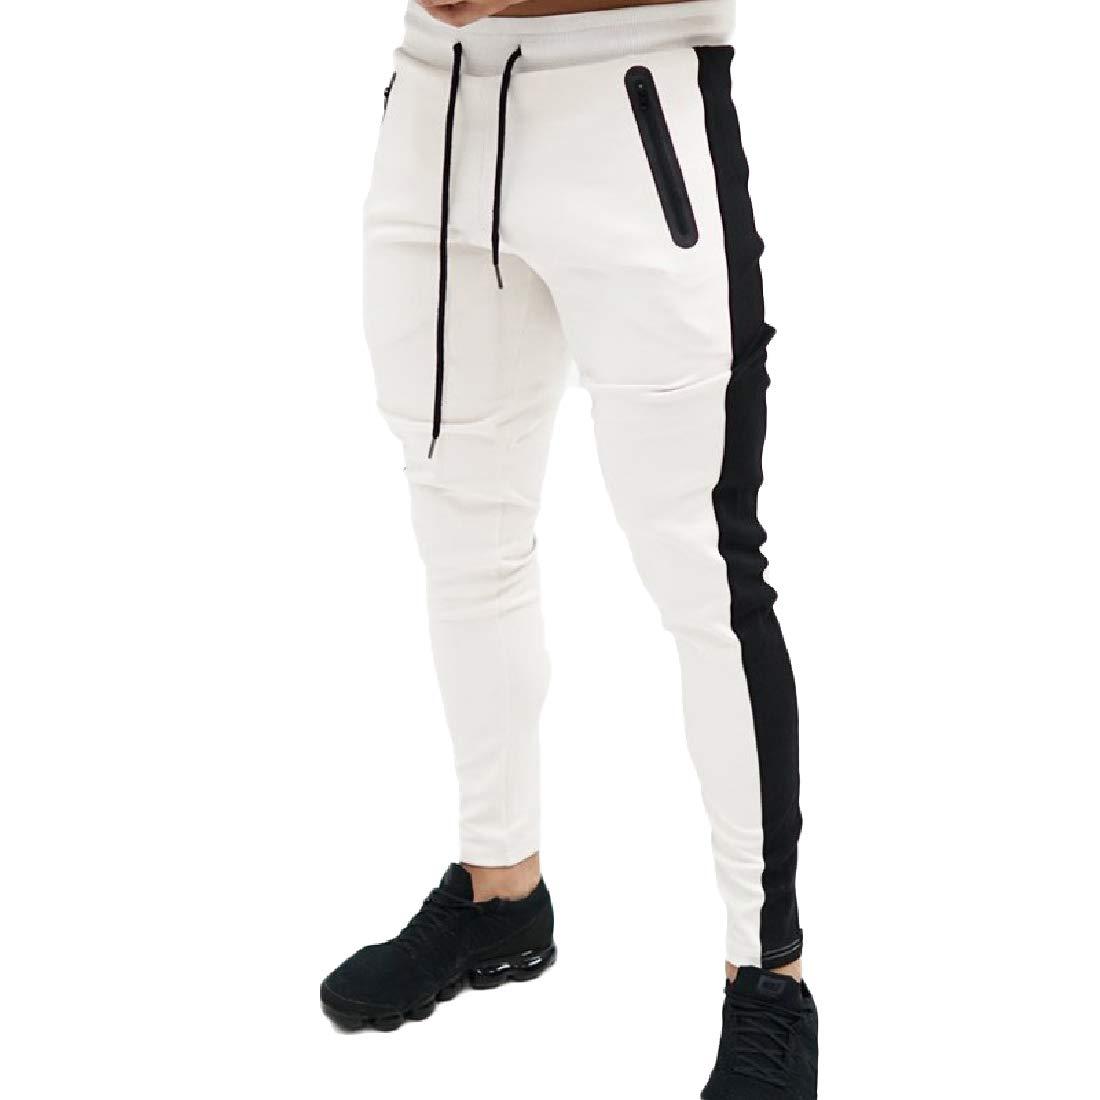 HEFASDM Men Harem Relaxed Fit Drawstring Sports Stretchy Joggers Pants